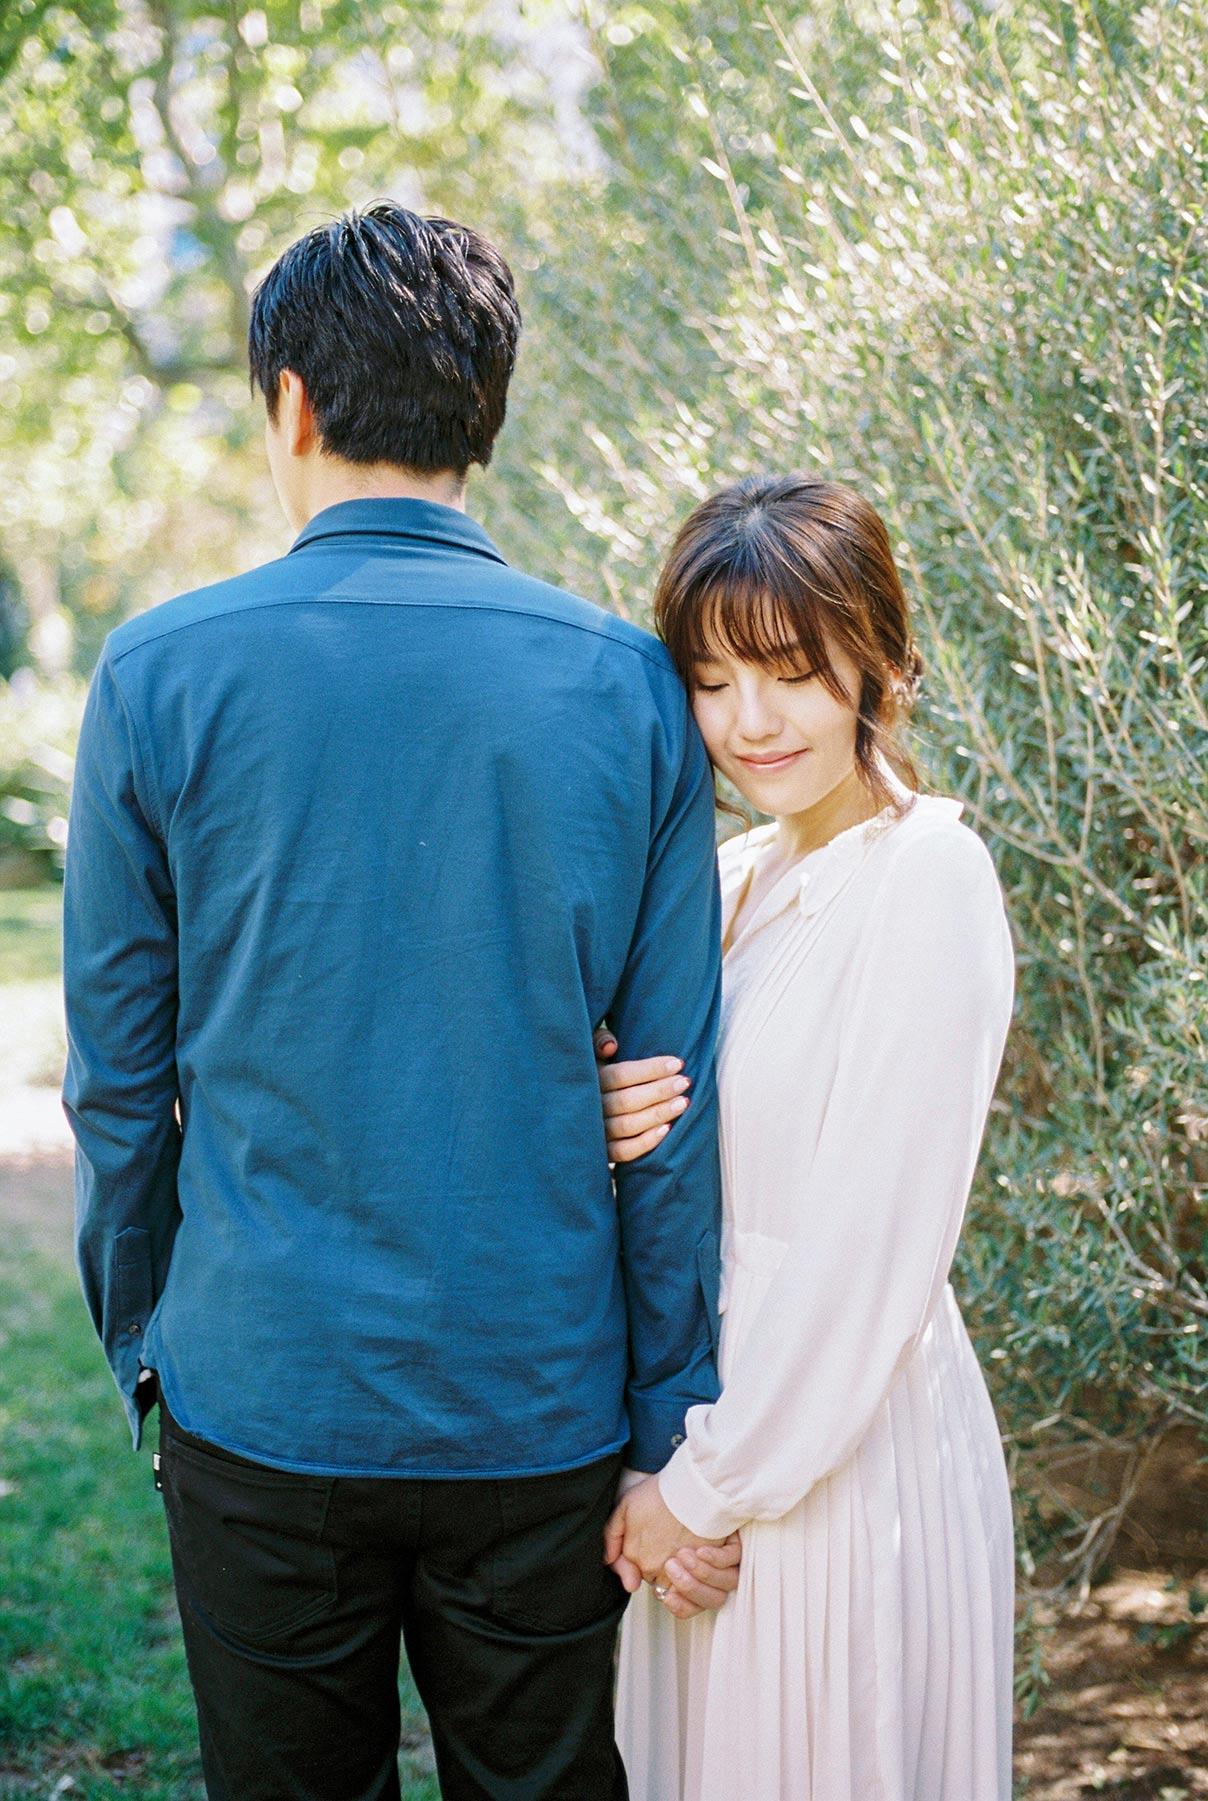 Lovely romantic couple| Engagement photographer | Fin Art Photographer | Lena Karelova Photography | Barcelona Film Wedding Photographer